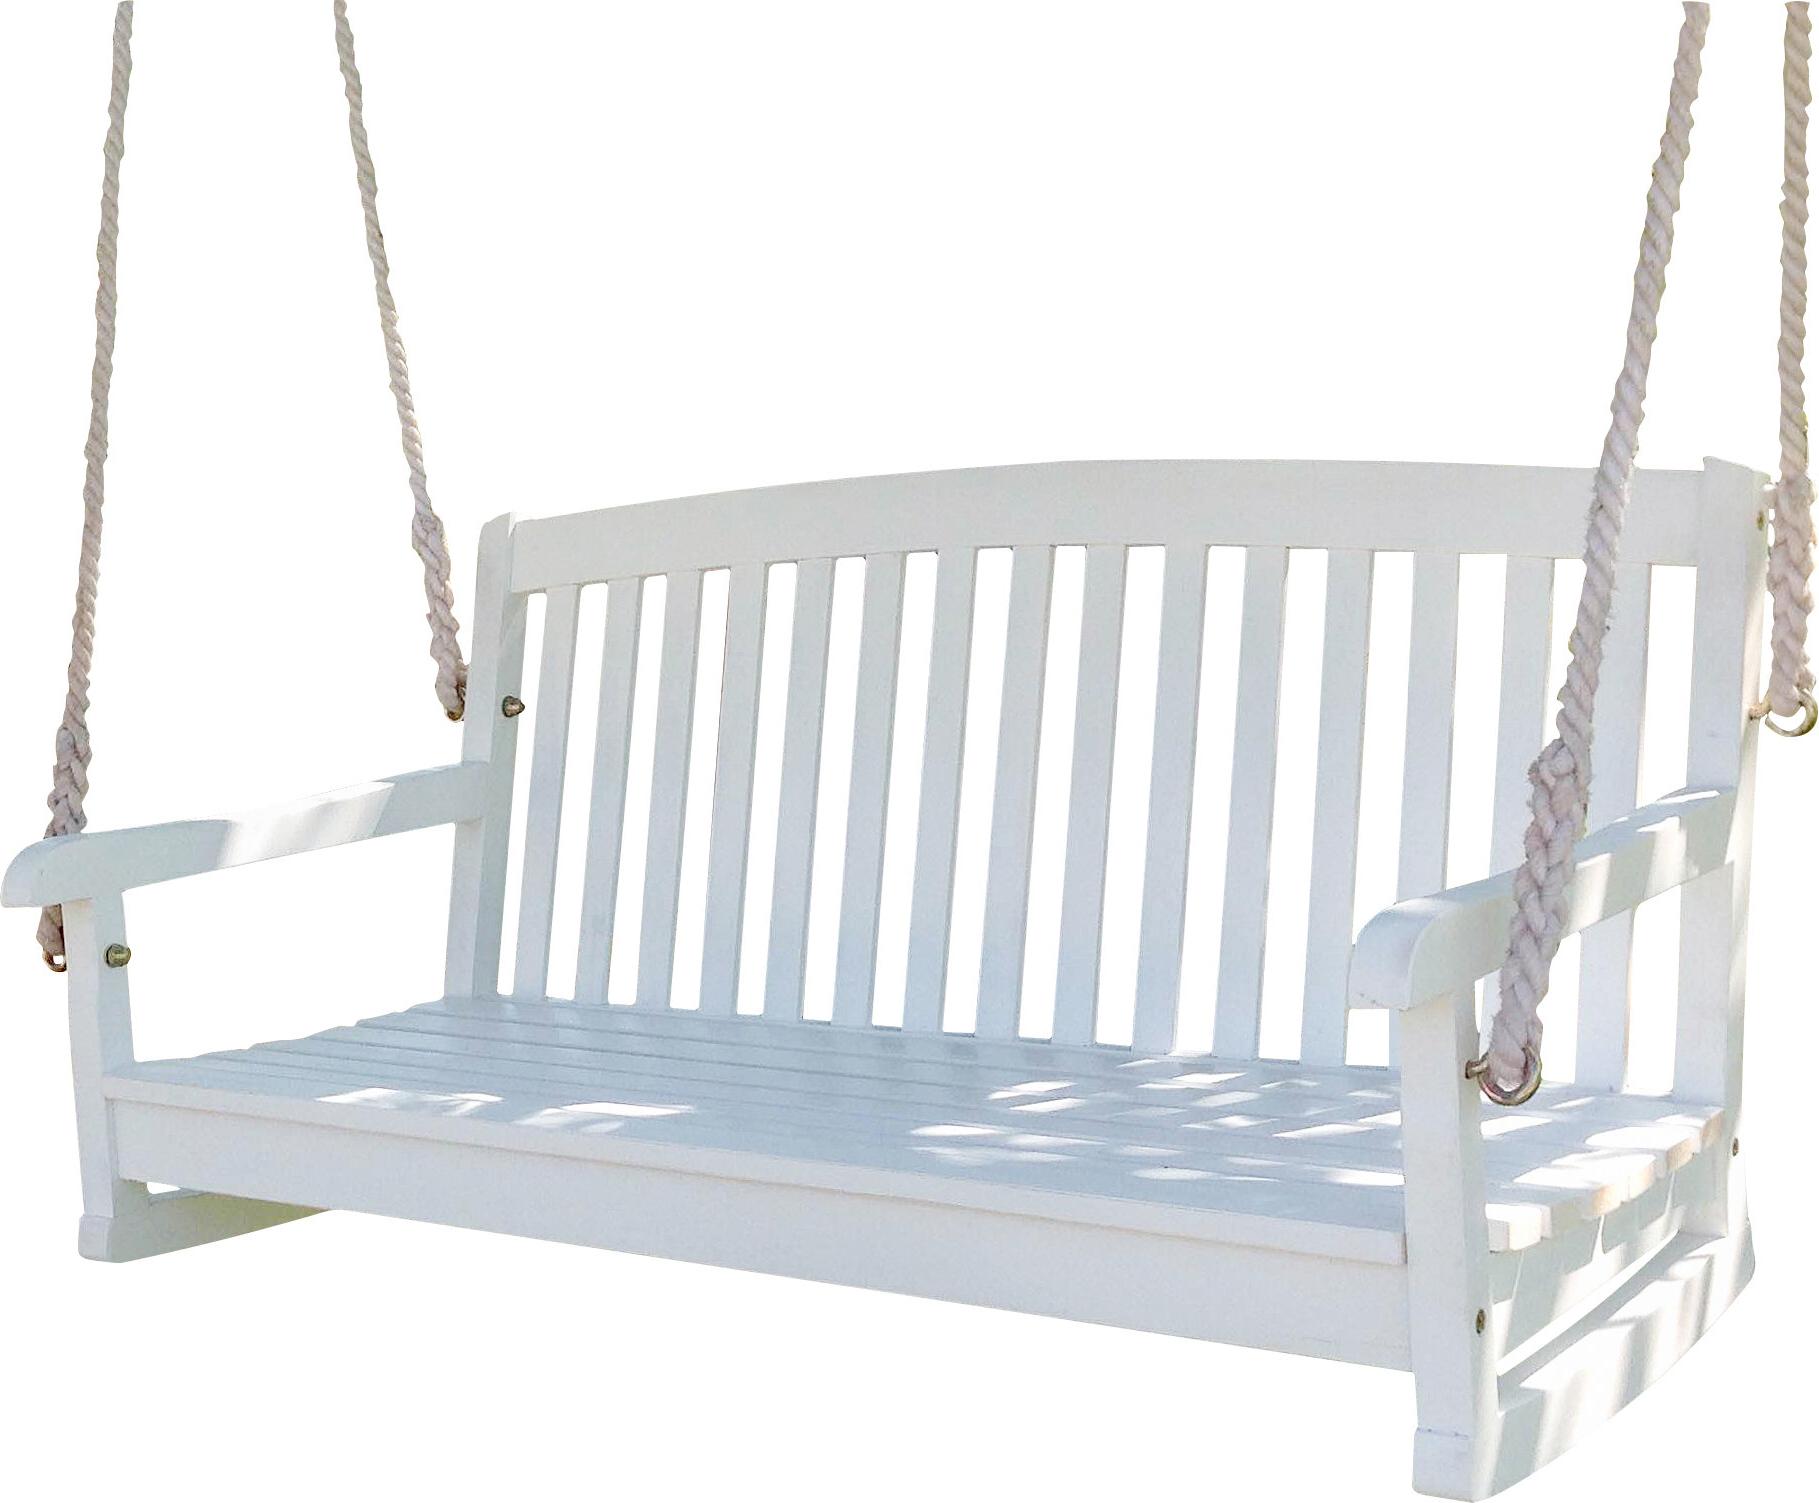 Popular Bristol Porch Swing Regarding Fordyce Porch Swings (View 11 of 25)